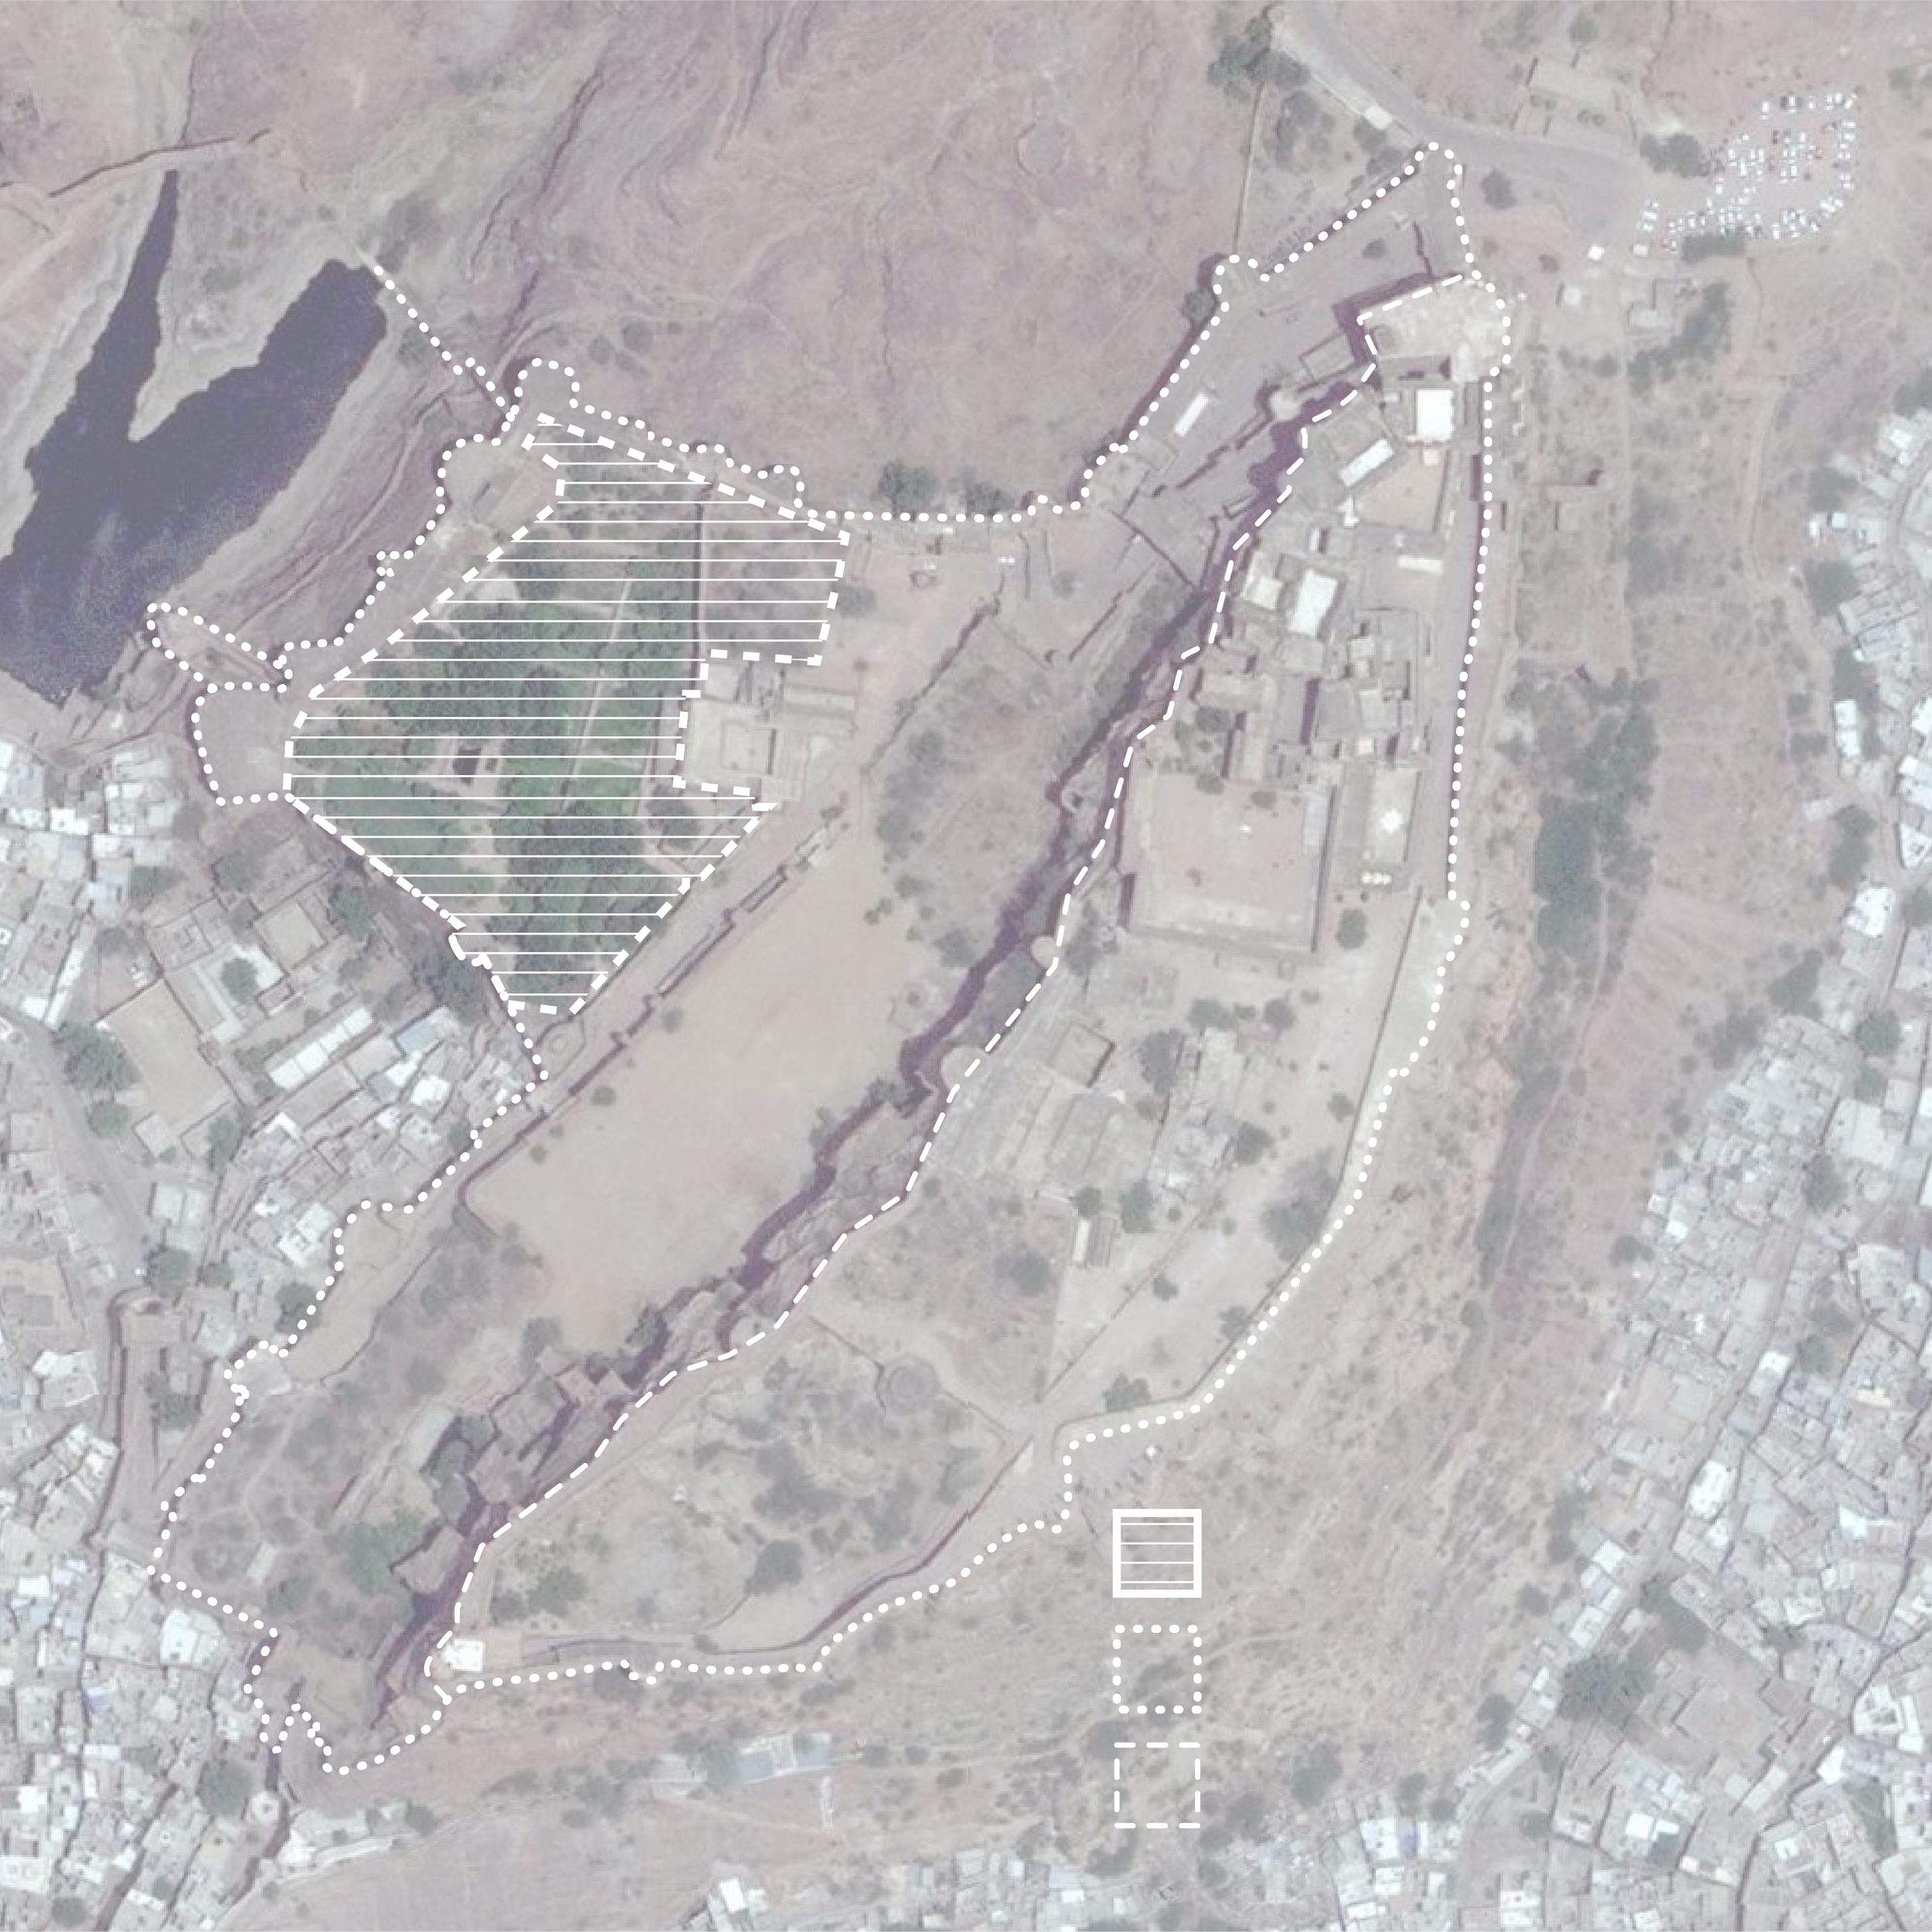 Figure2_Fort Map-02-01.jpg